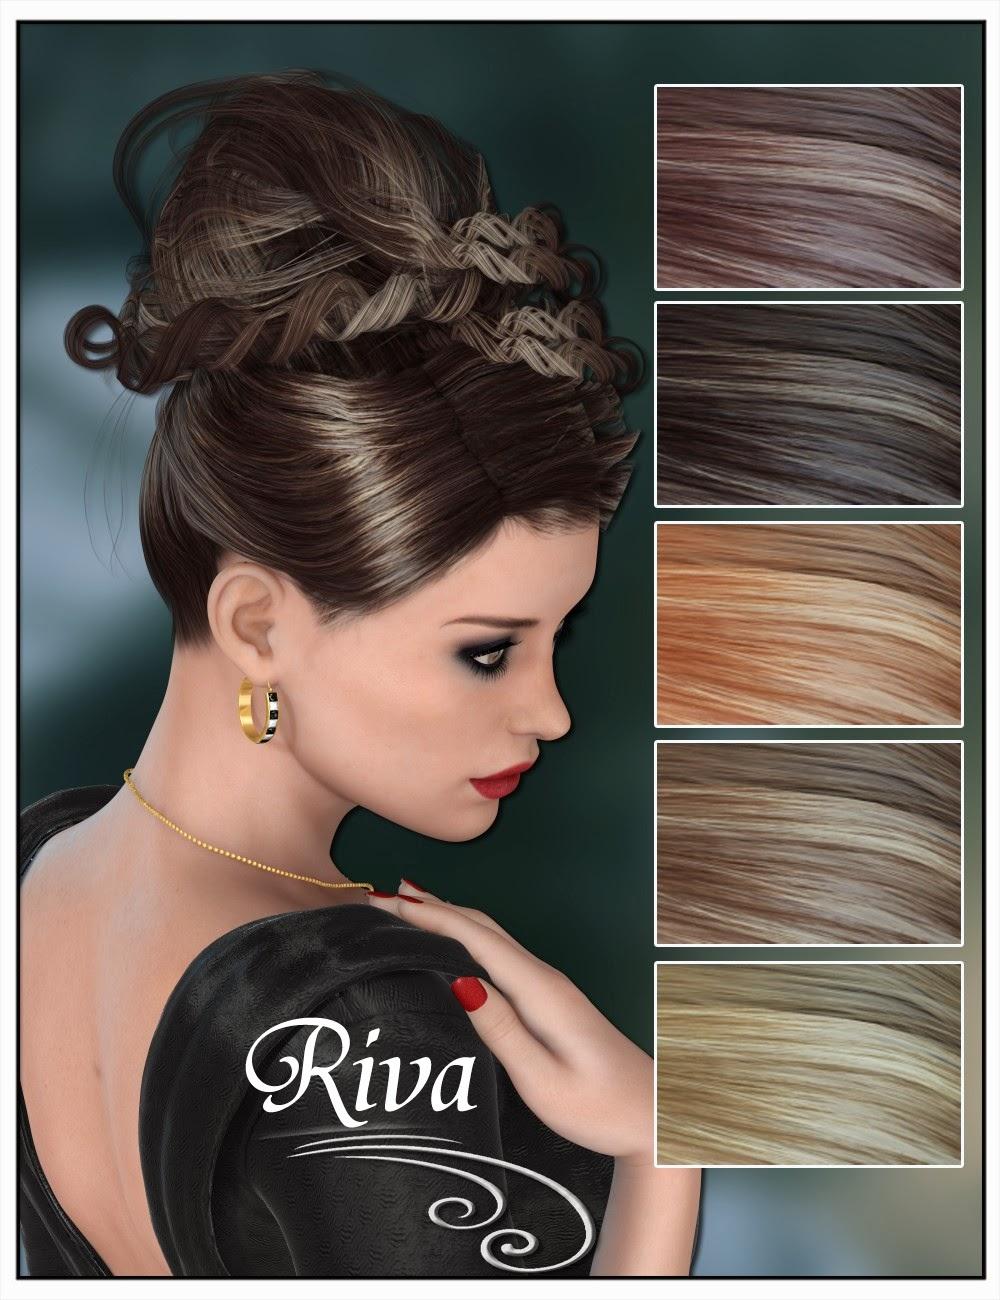 Riva Updo cheveux